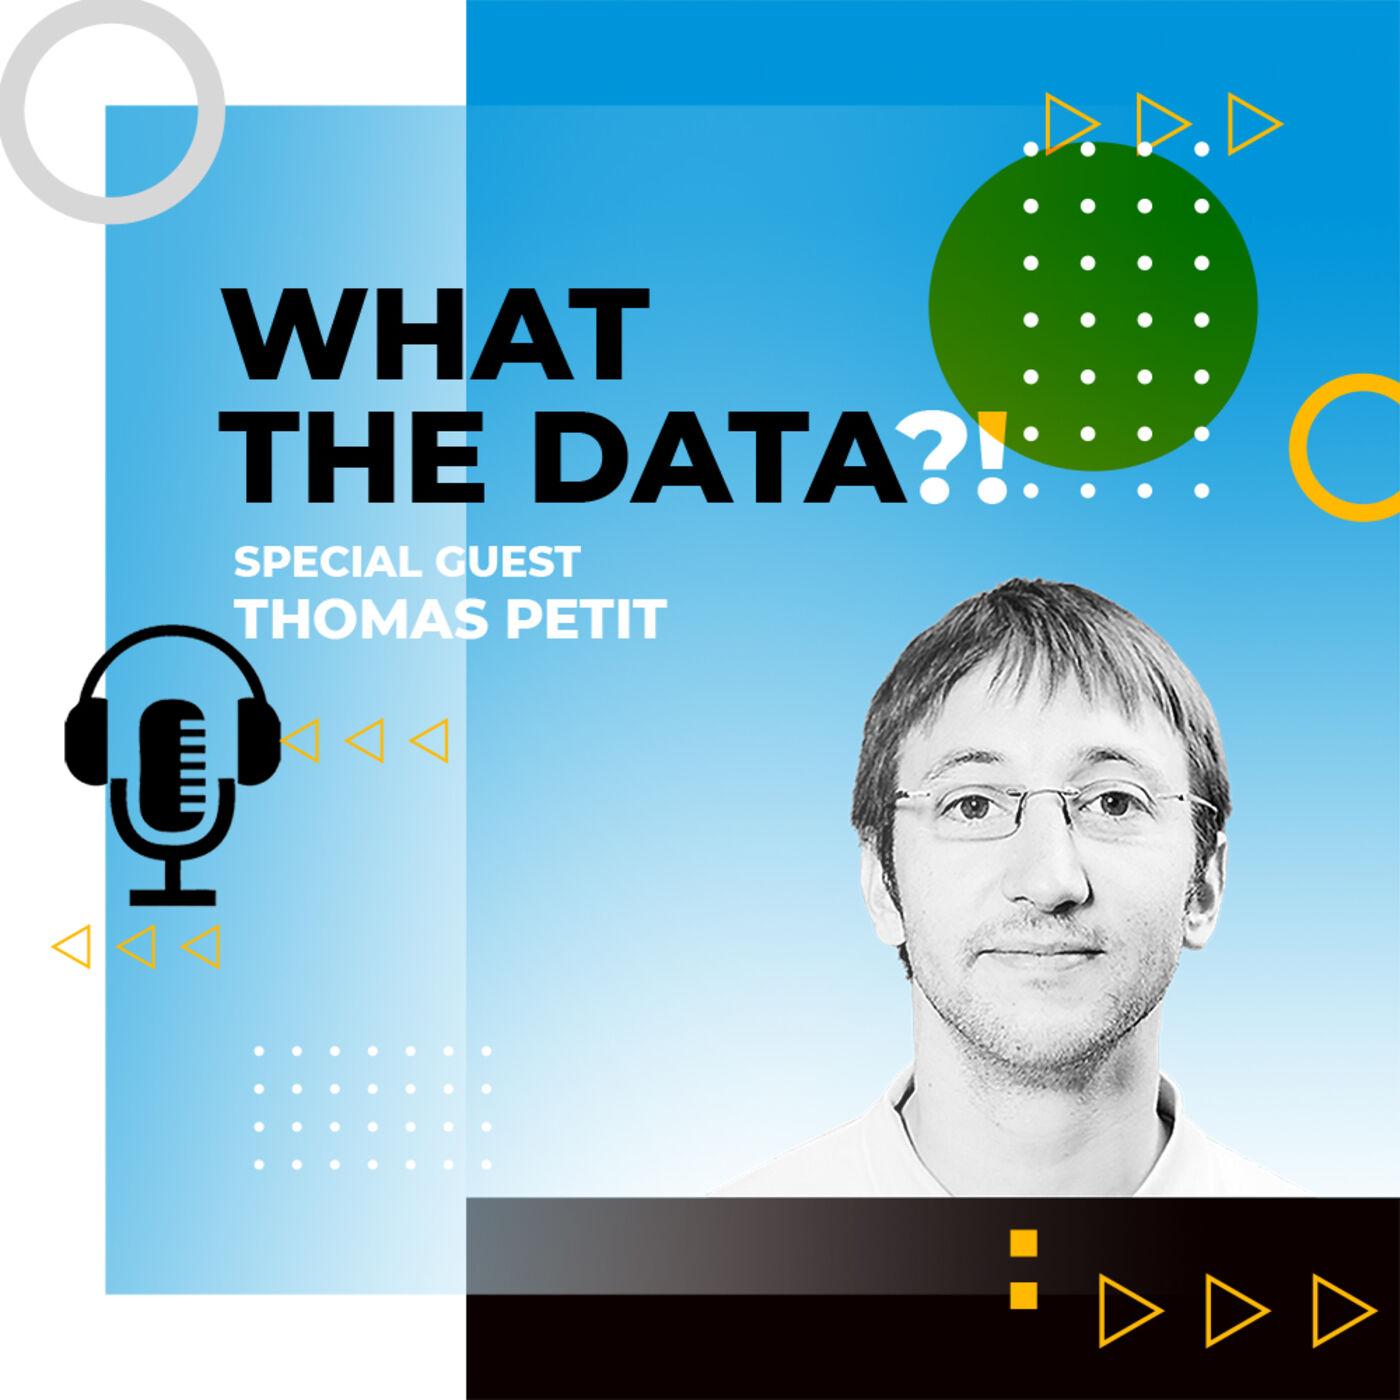 Thomas Petit - Data culture for startups (#13)